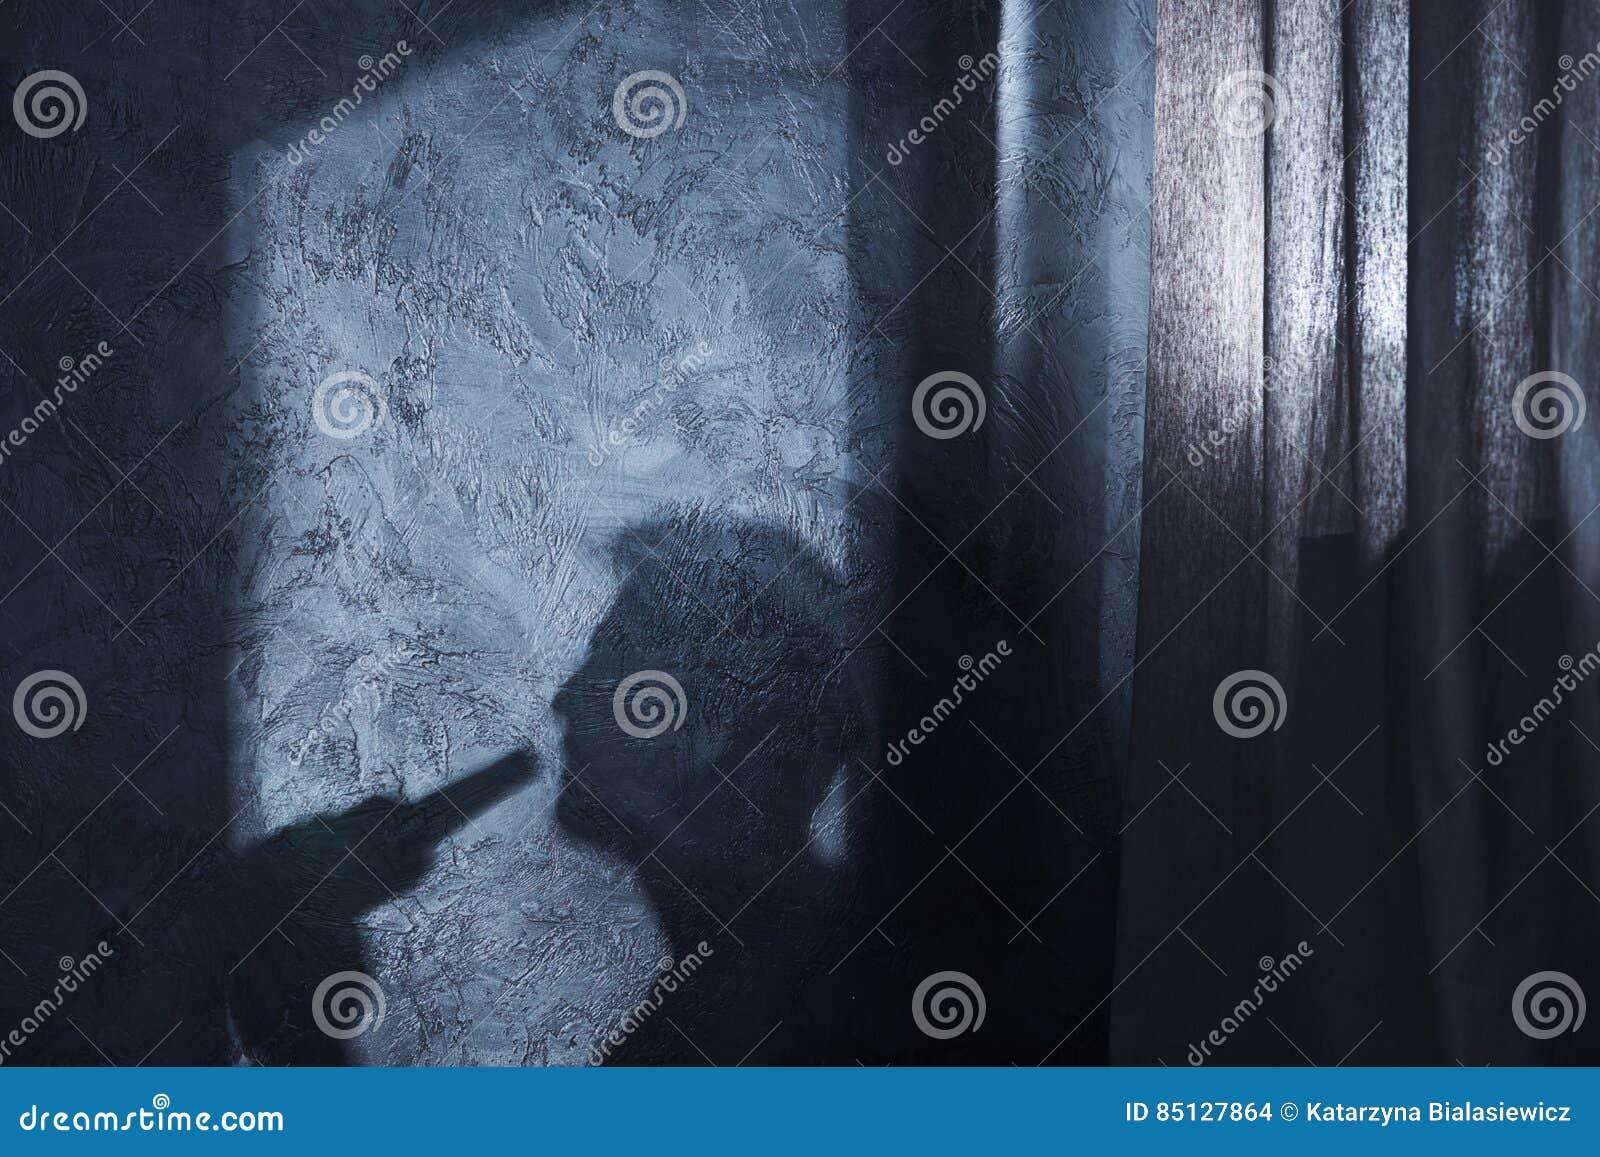 Sombra do homem bebendo